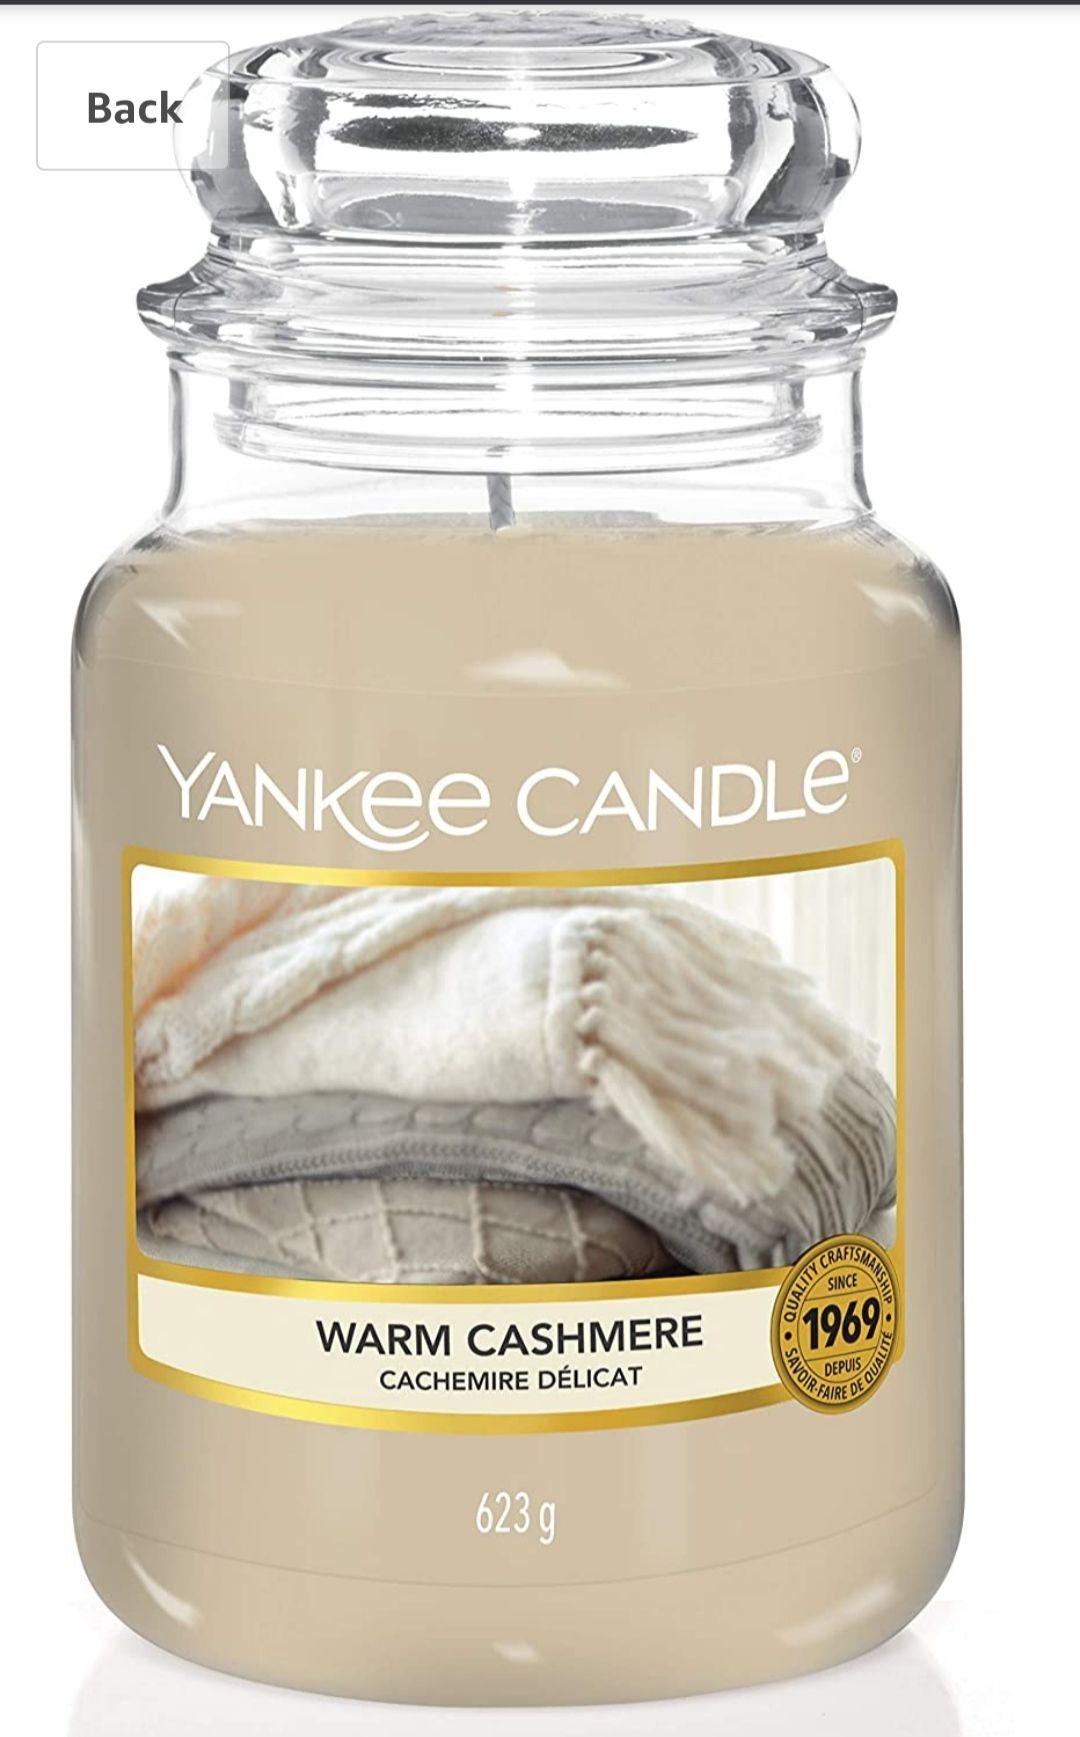 Yankee Candle Warm Cashmere Large Jar Candle £10.96 (+£4.49 non-prime) @ Amazon